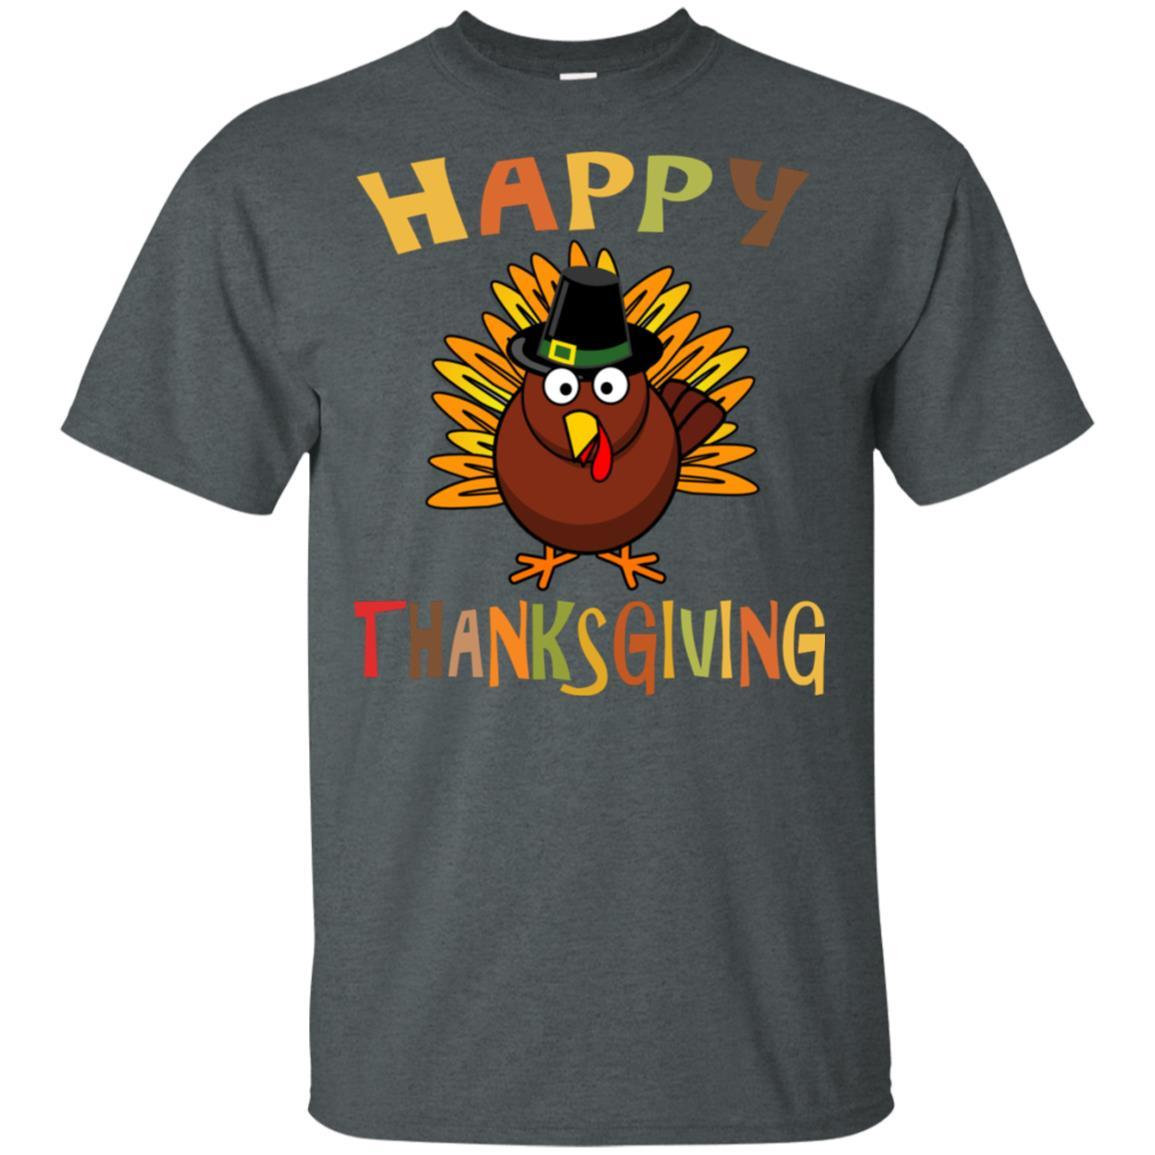 Thanksgiving Tshirt Happy Thanksgiving Unisex Short Sleeve